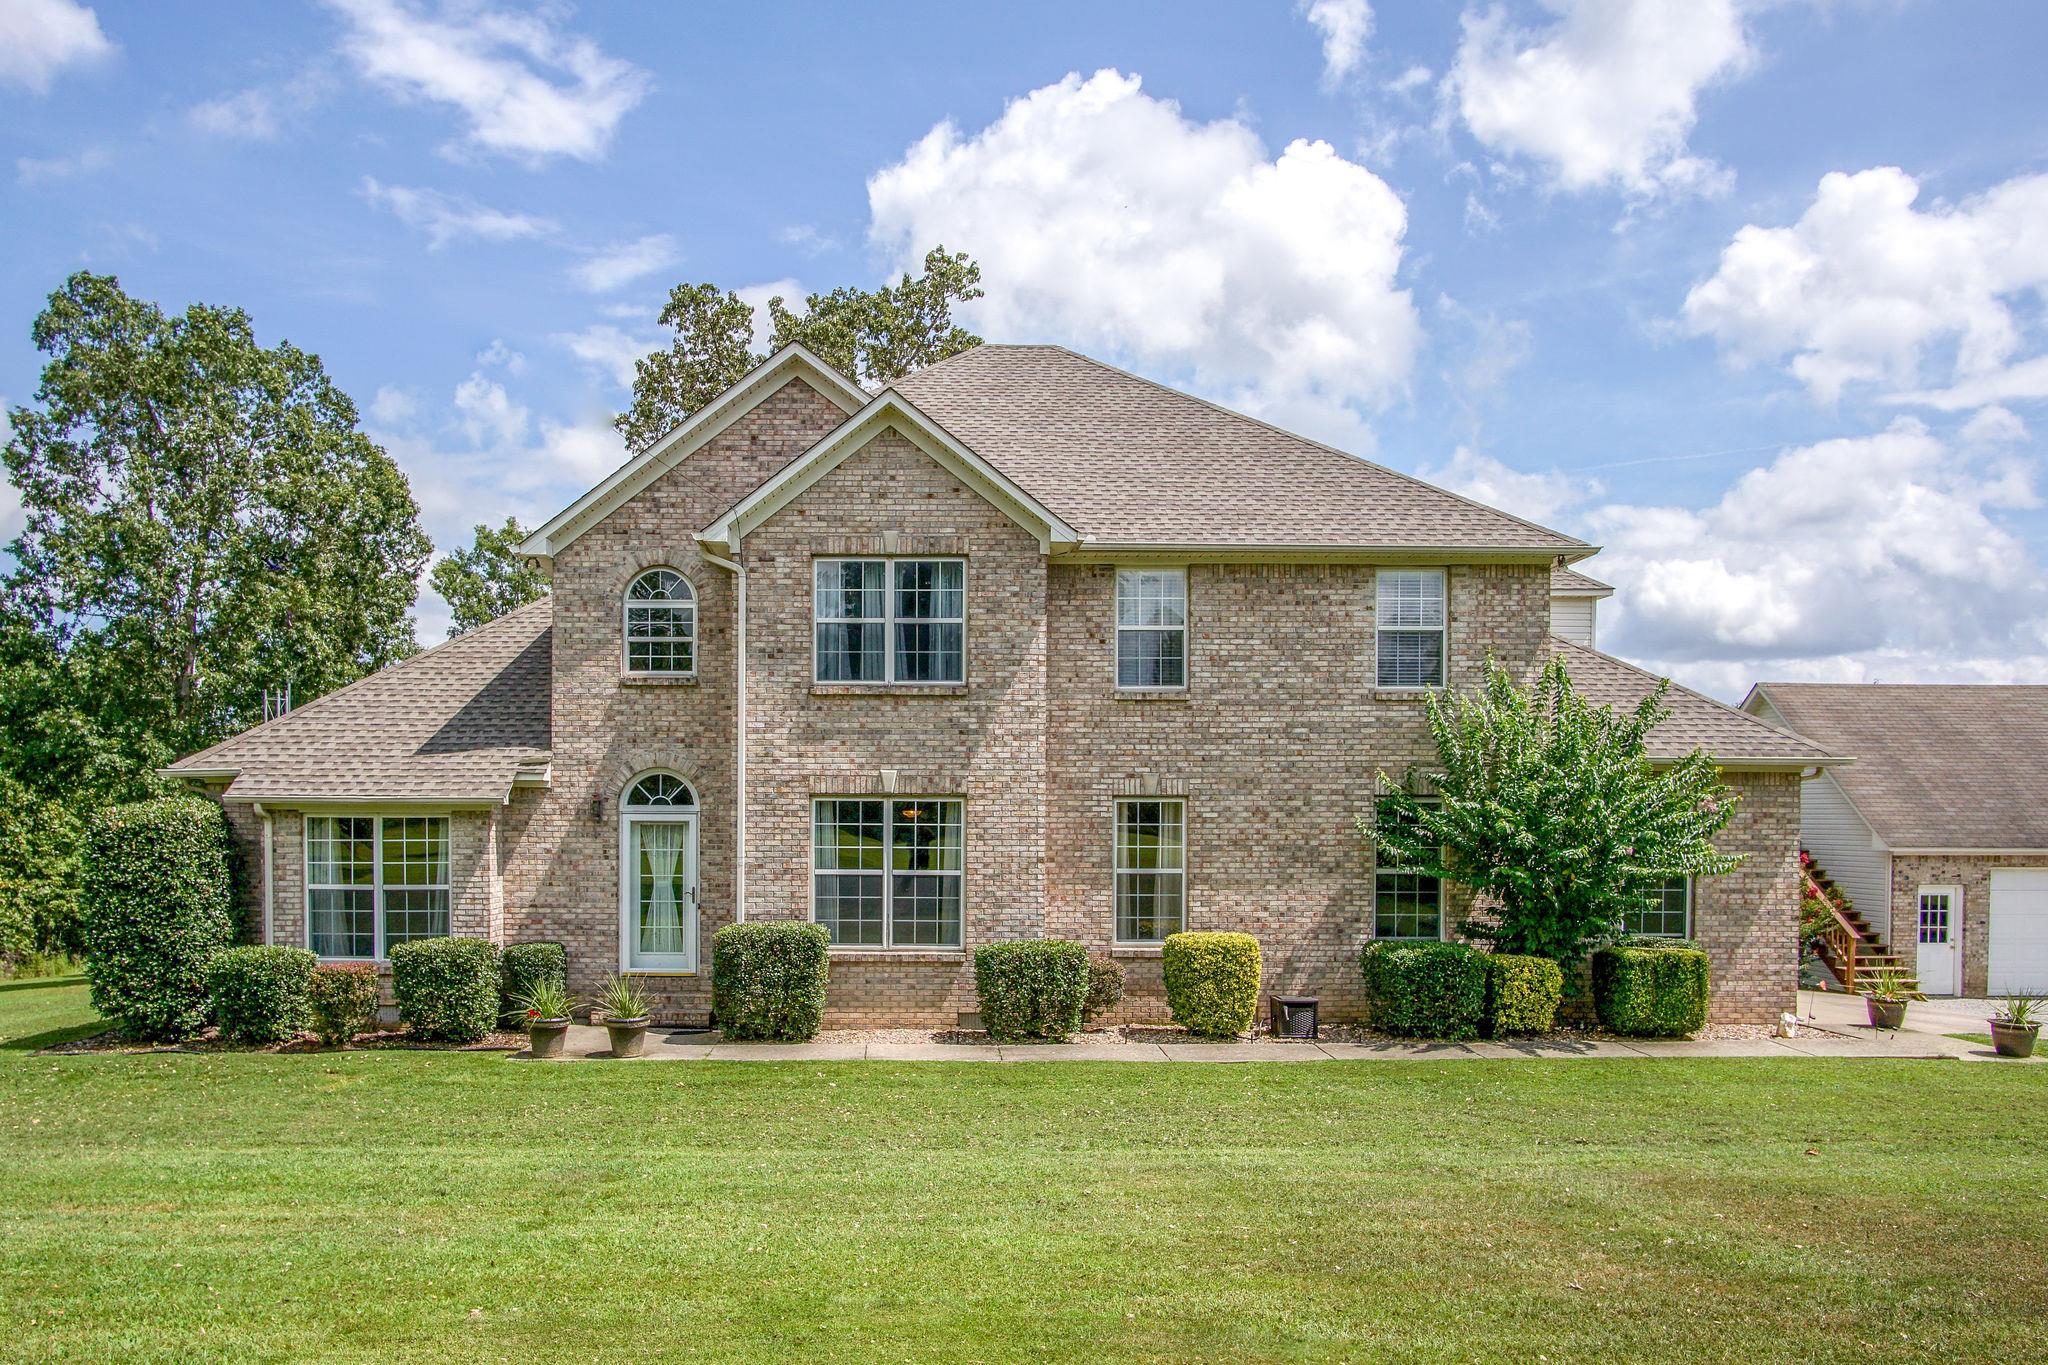 163 Downs Dr, Hampshire, TN 38461 - Hampshire, TN real estate listing